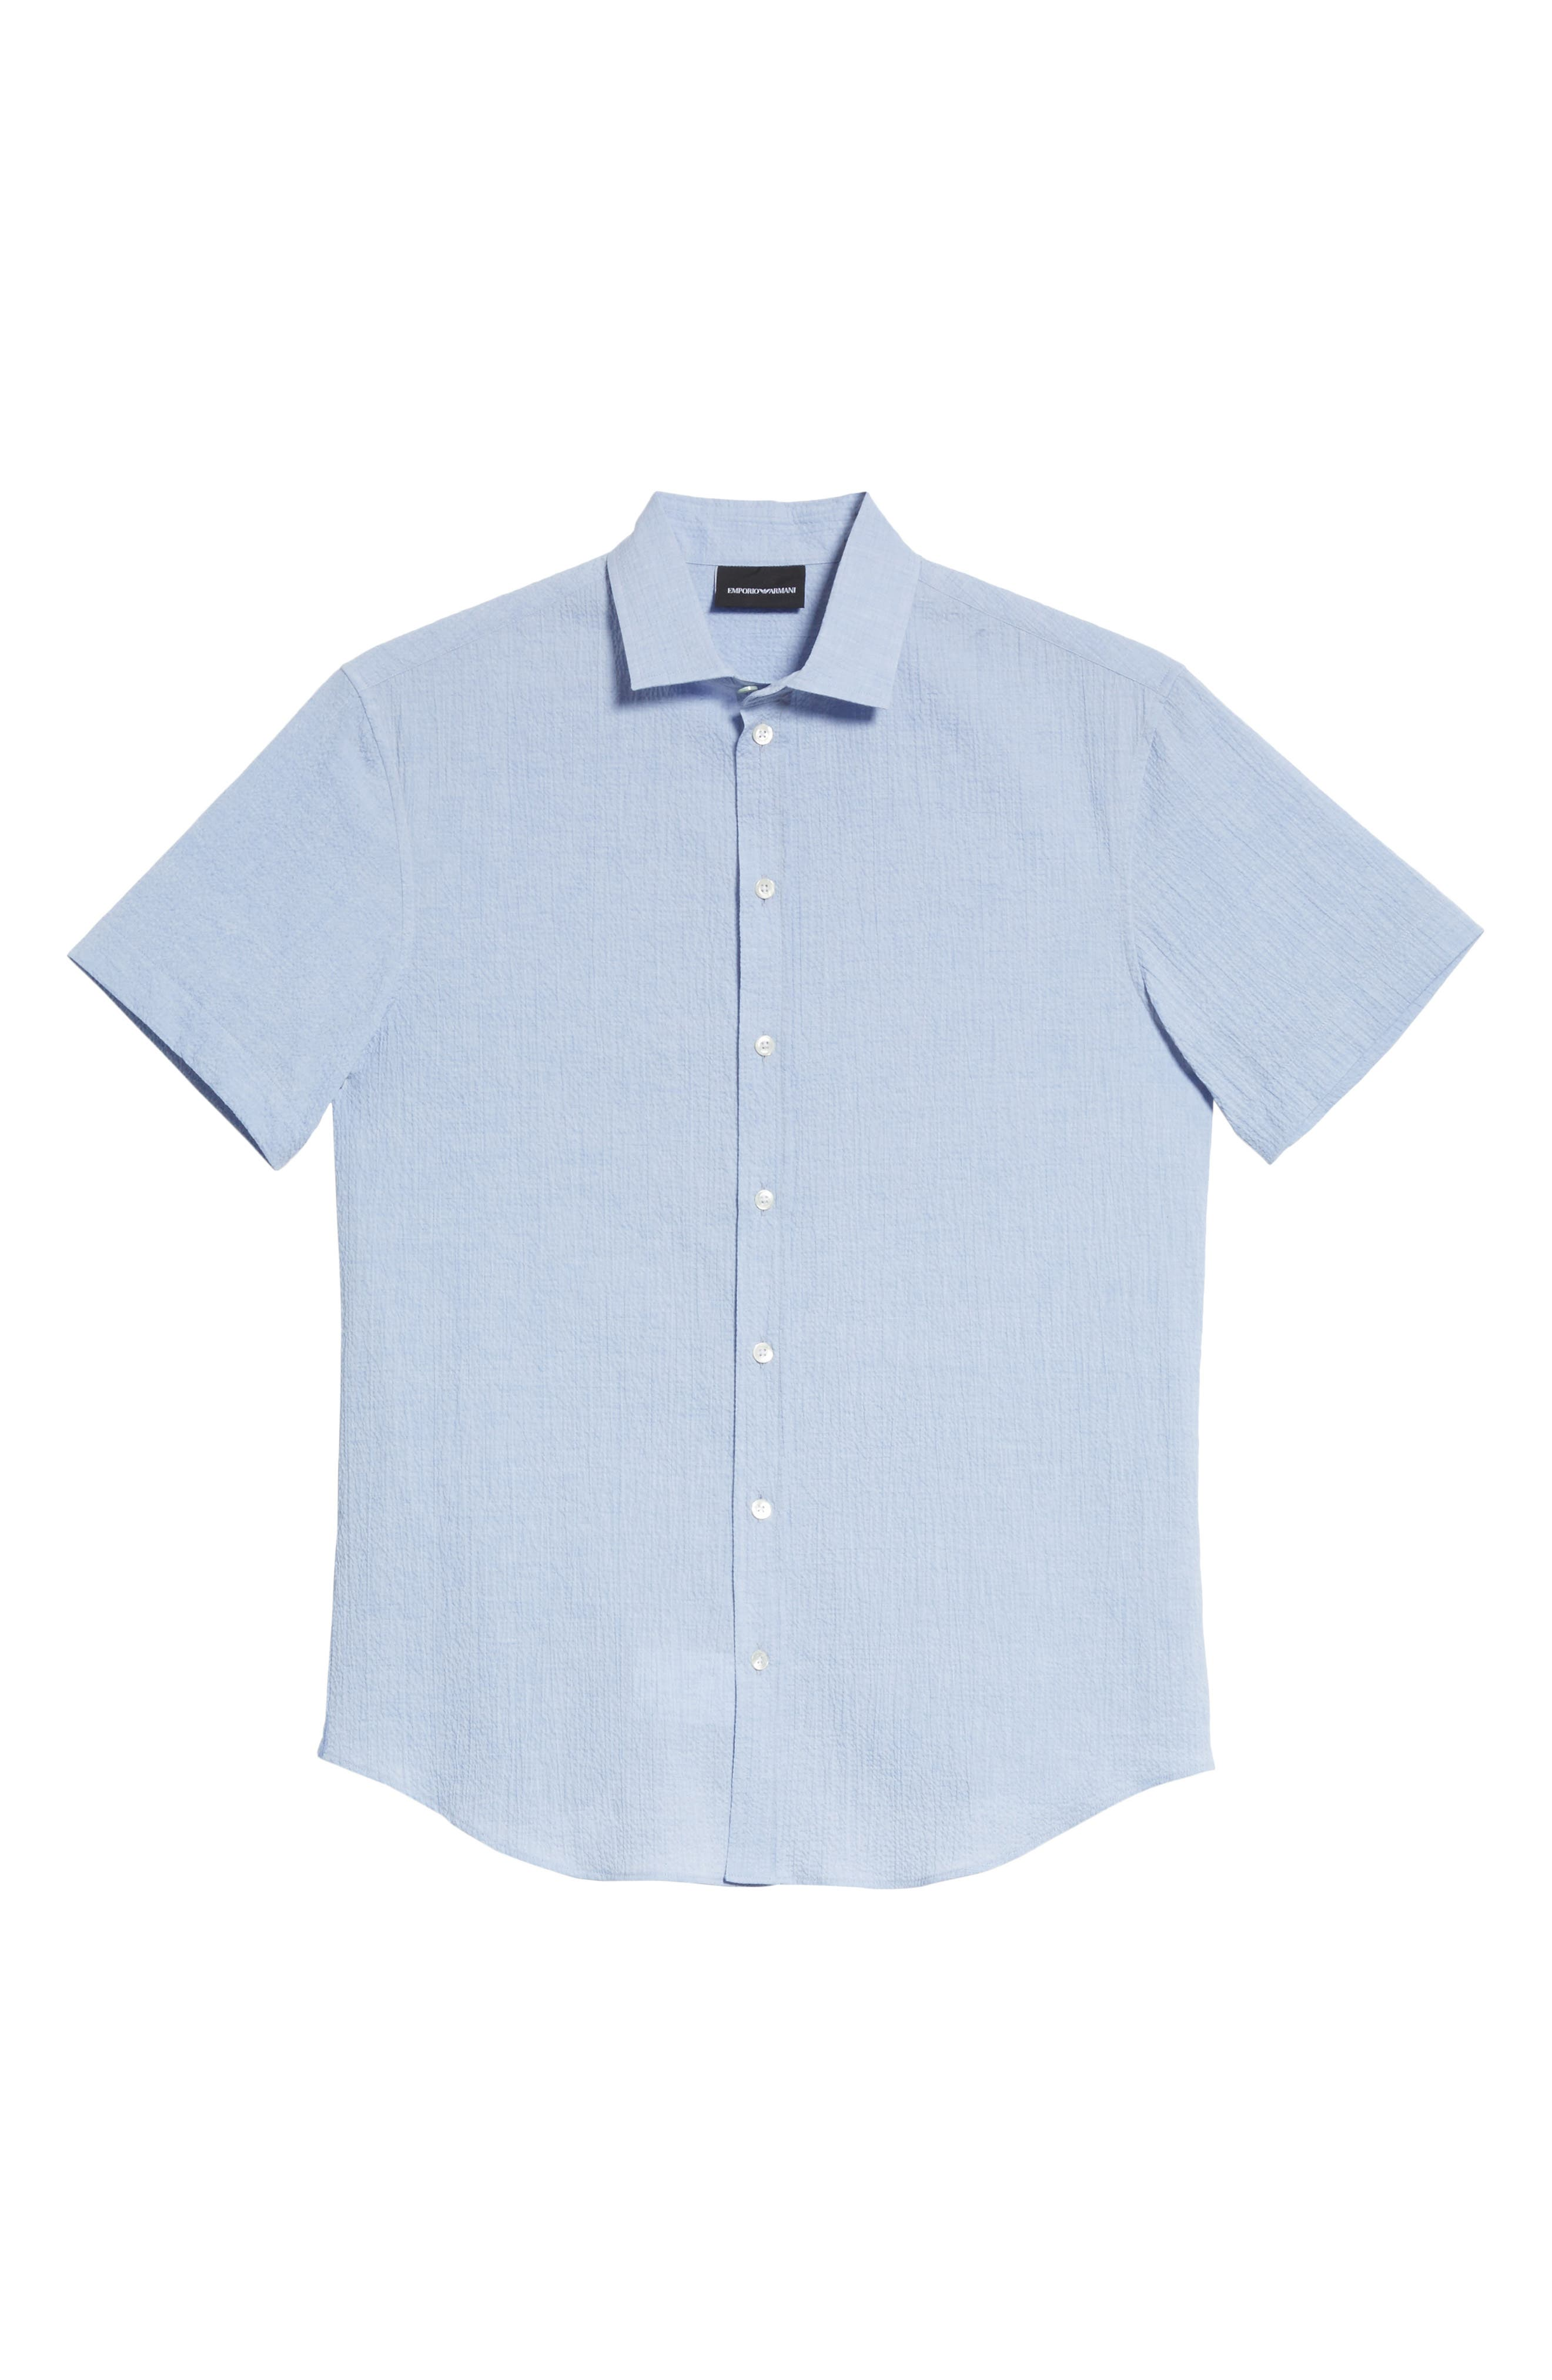 Regular Fit Seersucker Sport Shirt,                             Alternate thumbnail 6, color,                             428